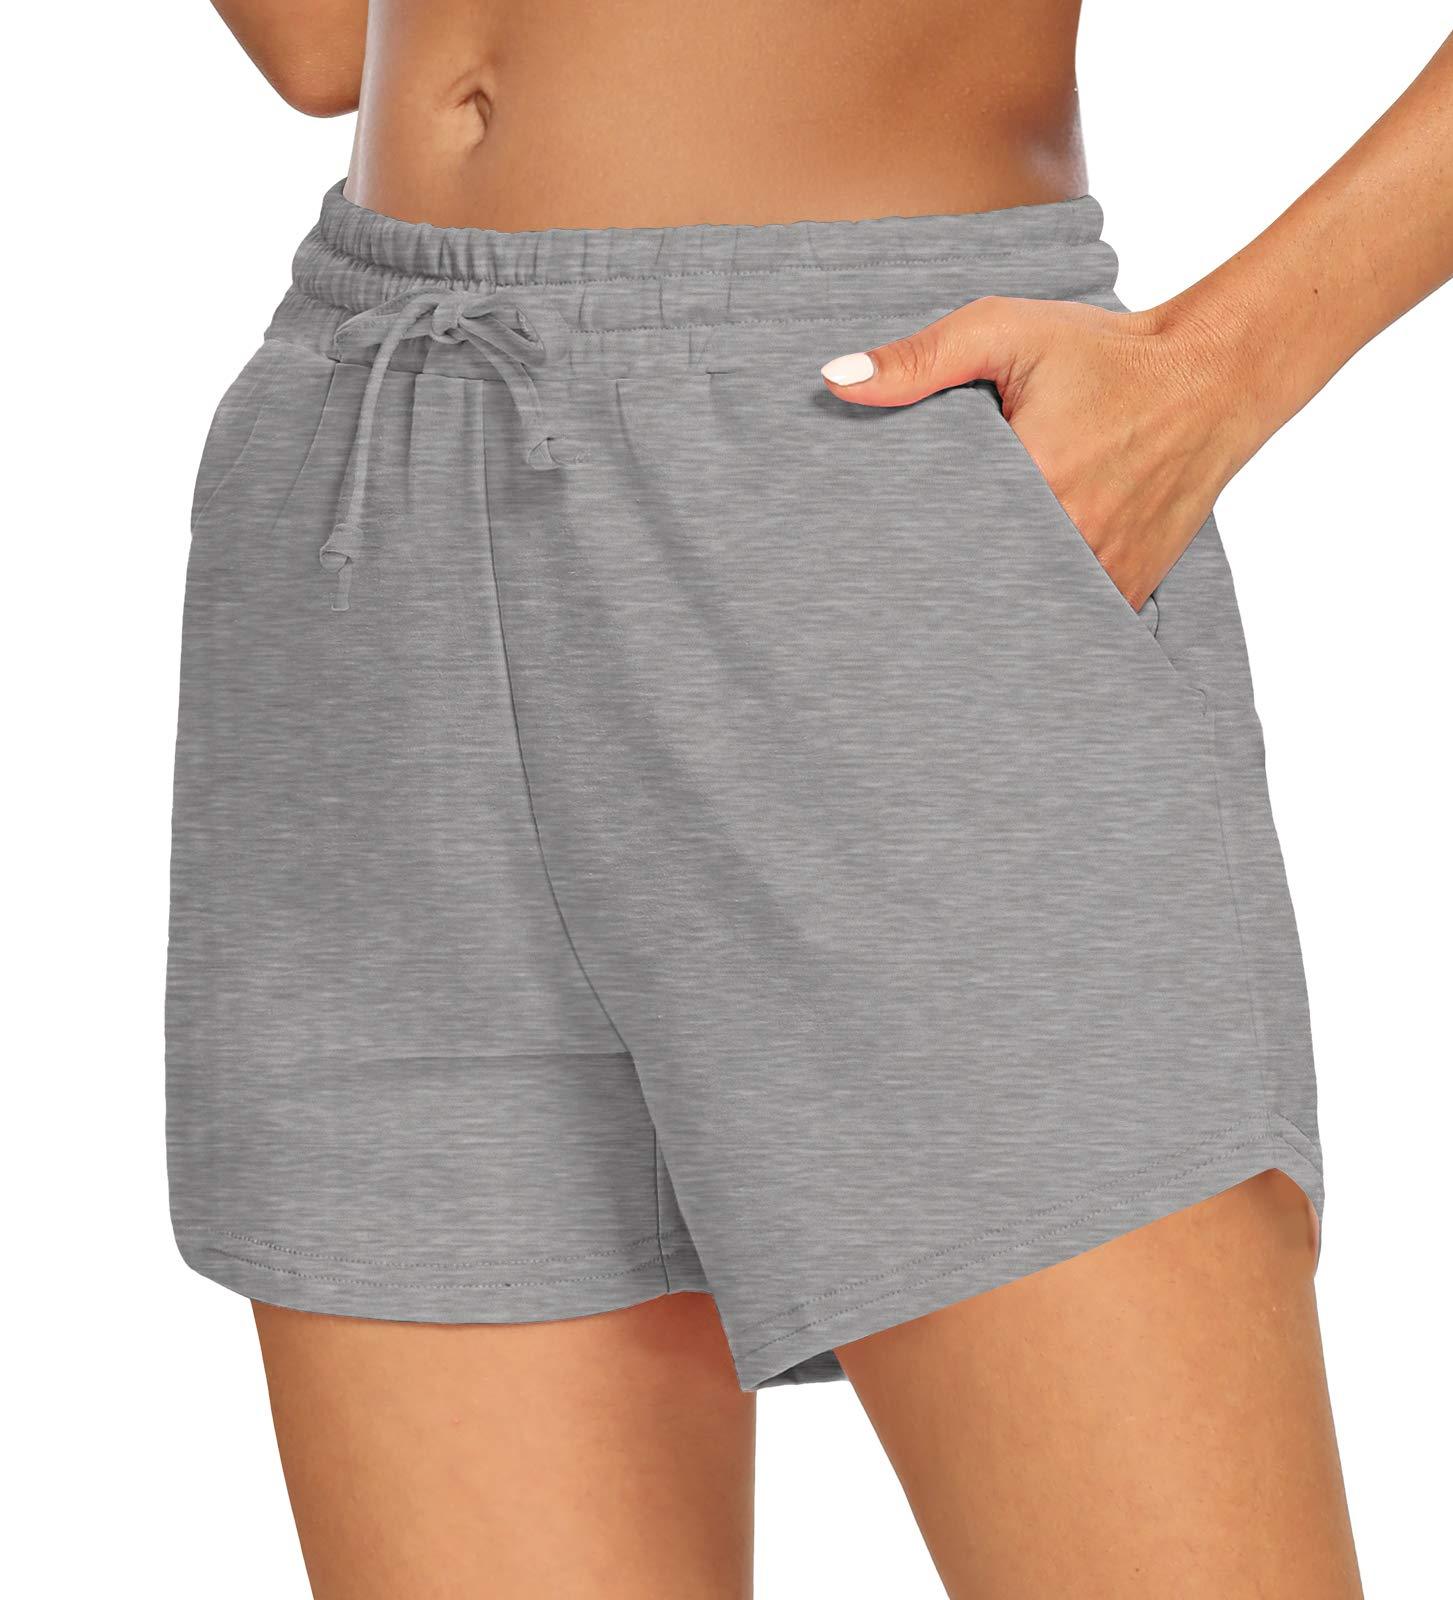 Sarin Mathews Womens Yoga Shorts Comfy Drawstring Lounge Active Workout Running Pants with Pockets